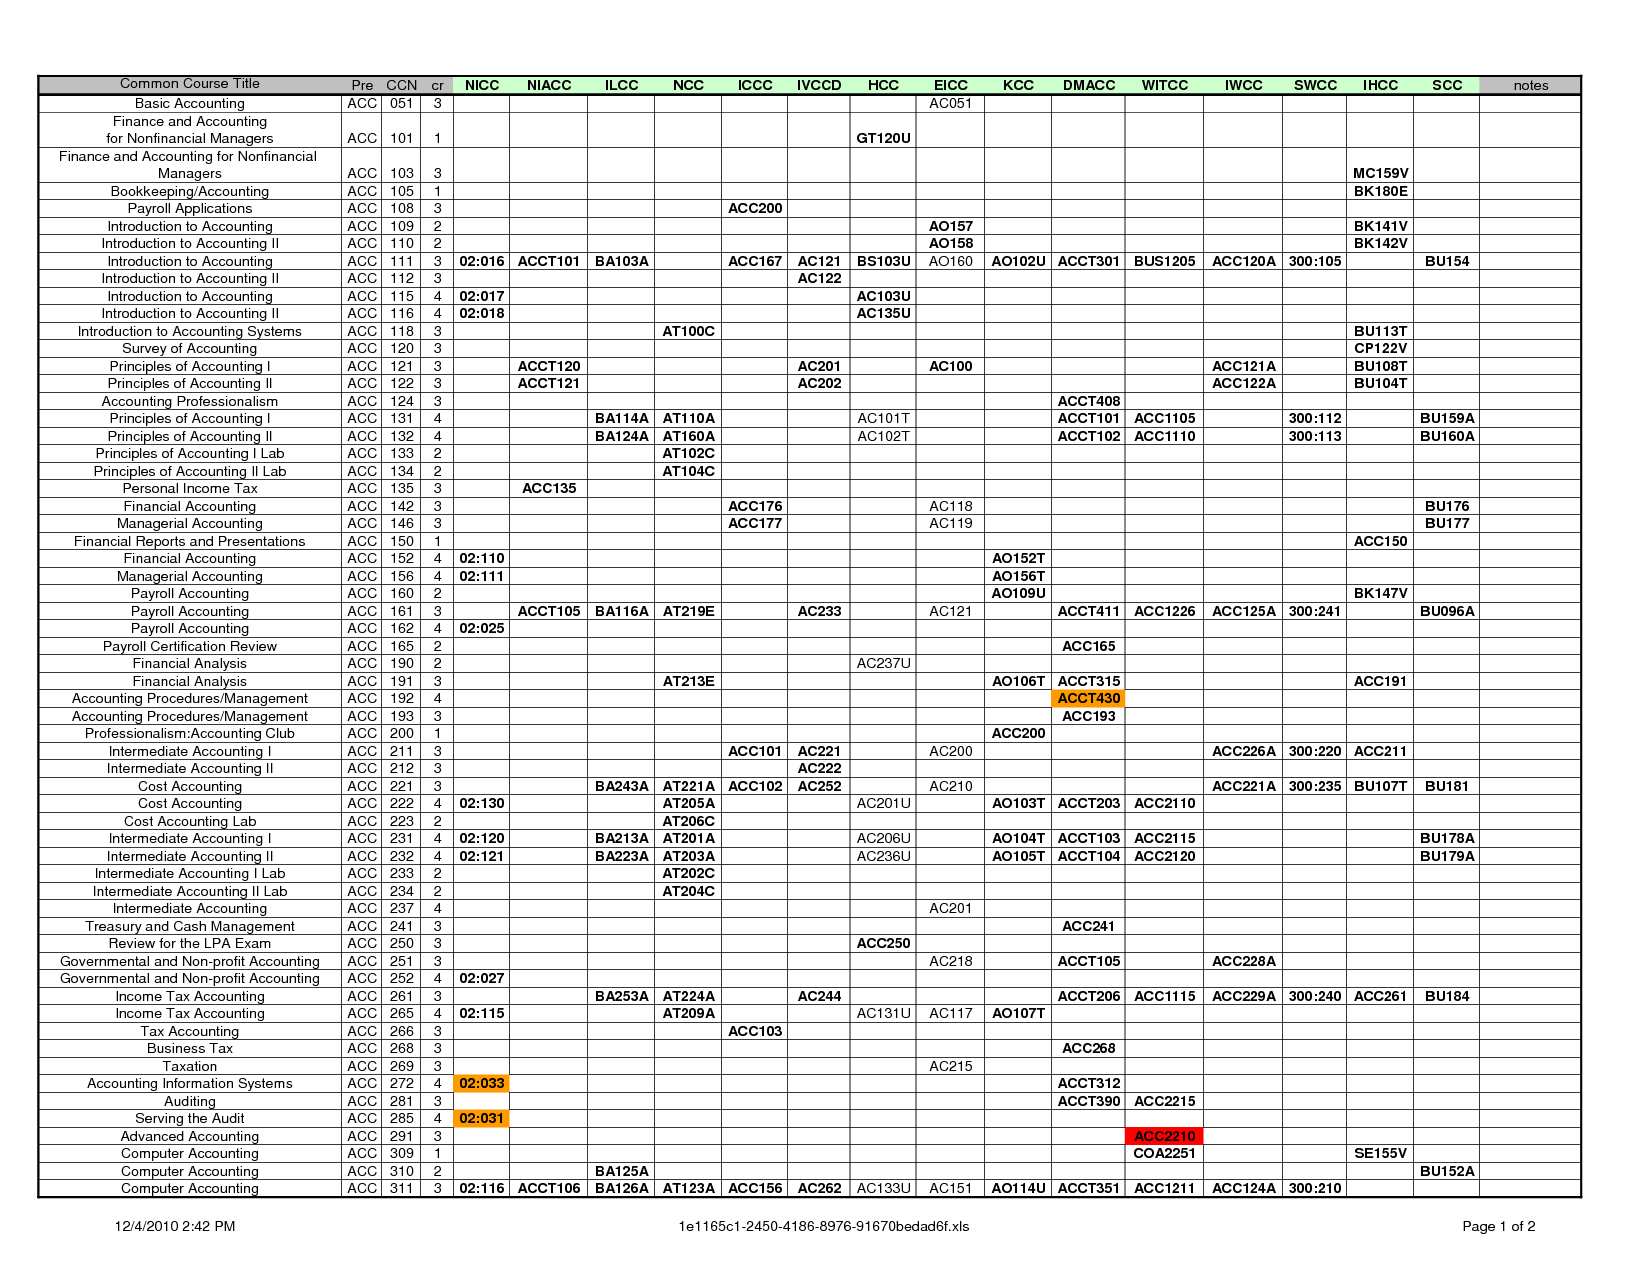 Renovation Spreadsheet Template Renovation Spreadsheet Spreadsheet Templates For Busines Simple